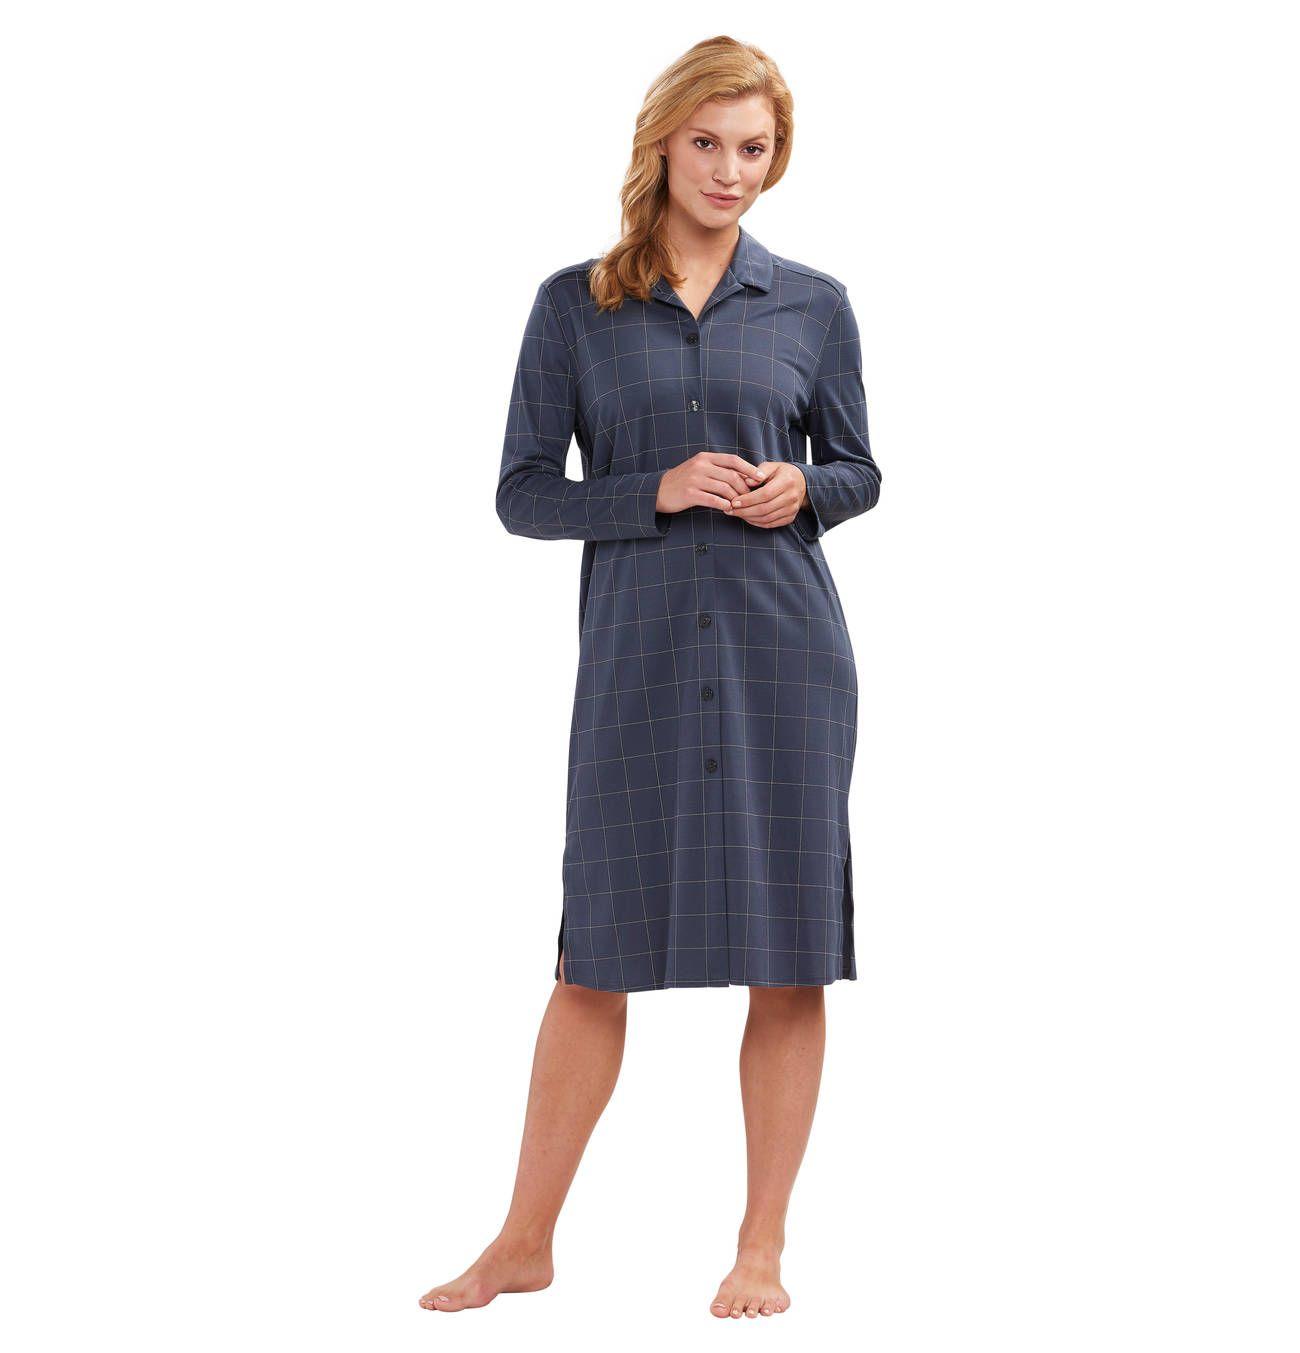 Nachthemd, lang, Knopfleiste  Nachthemd lang, Nachthemd und Wolle